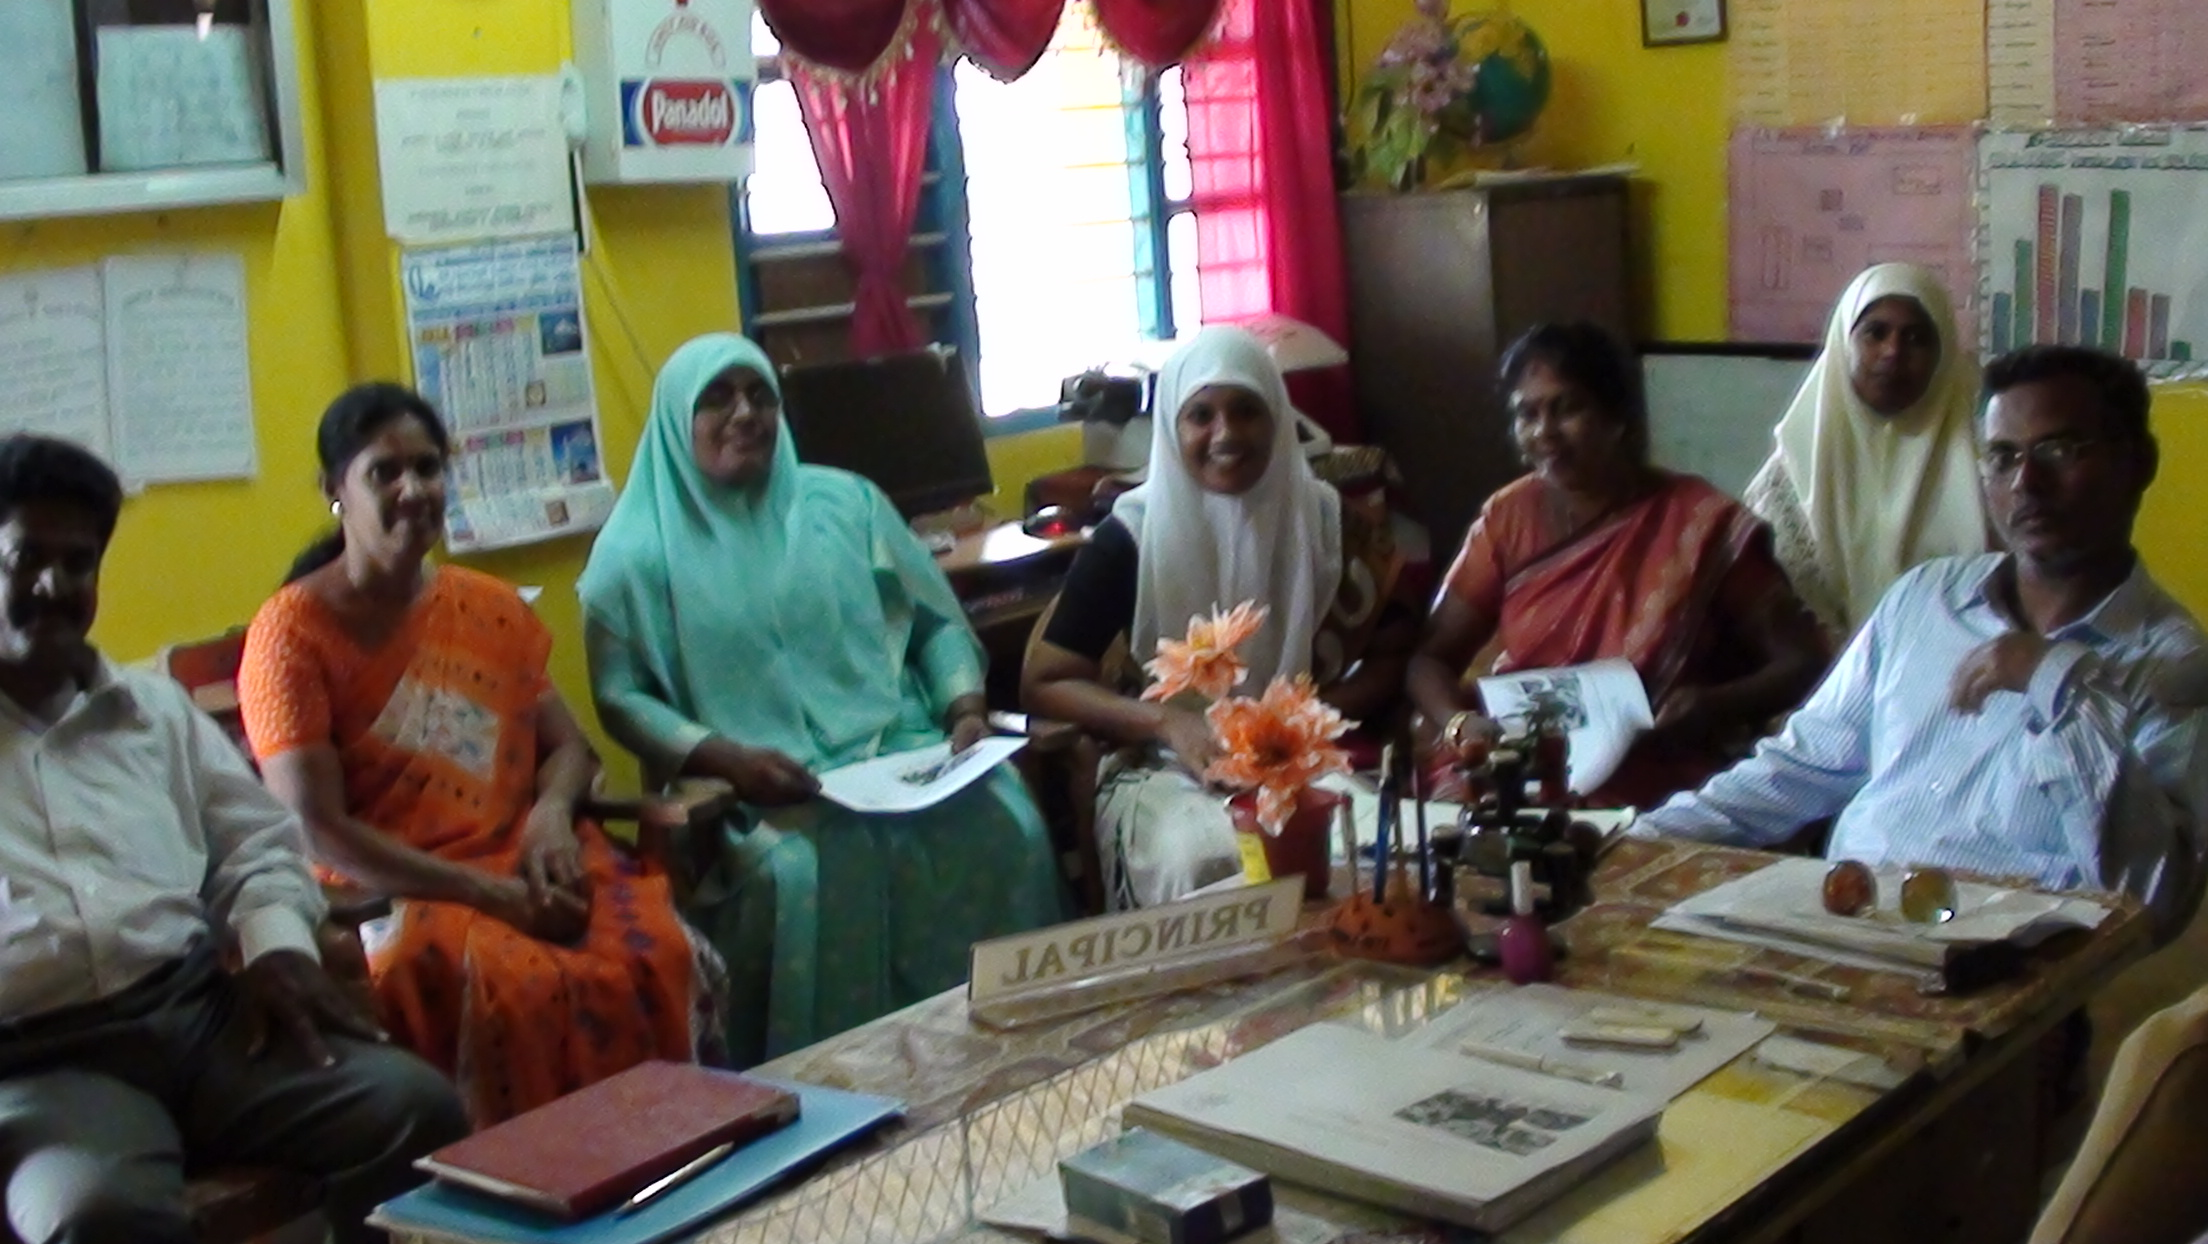 Al-Madina School Staff January 2013